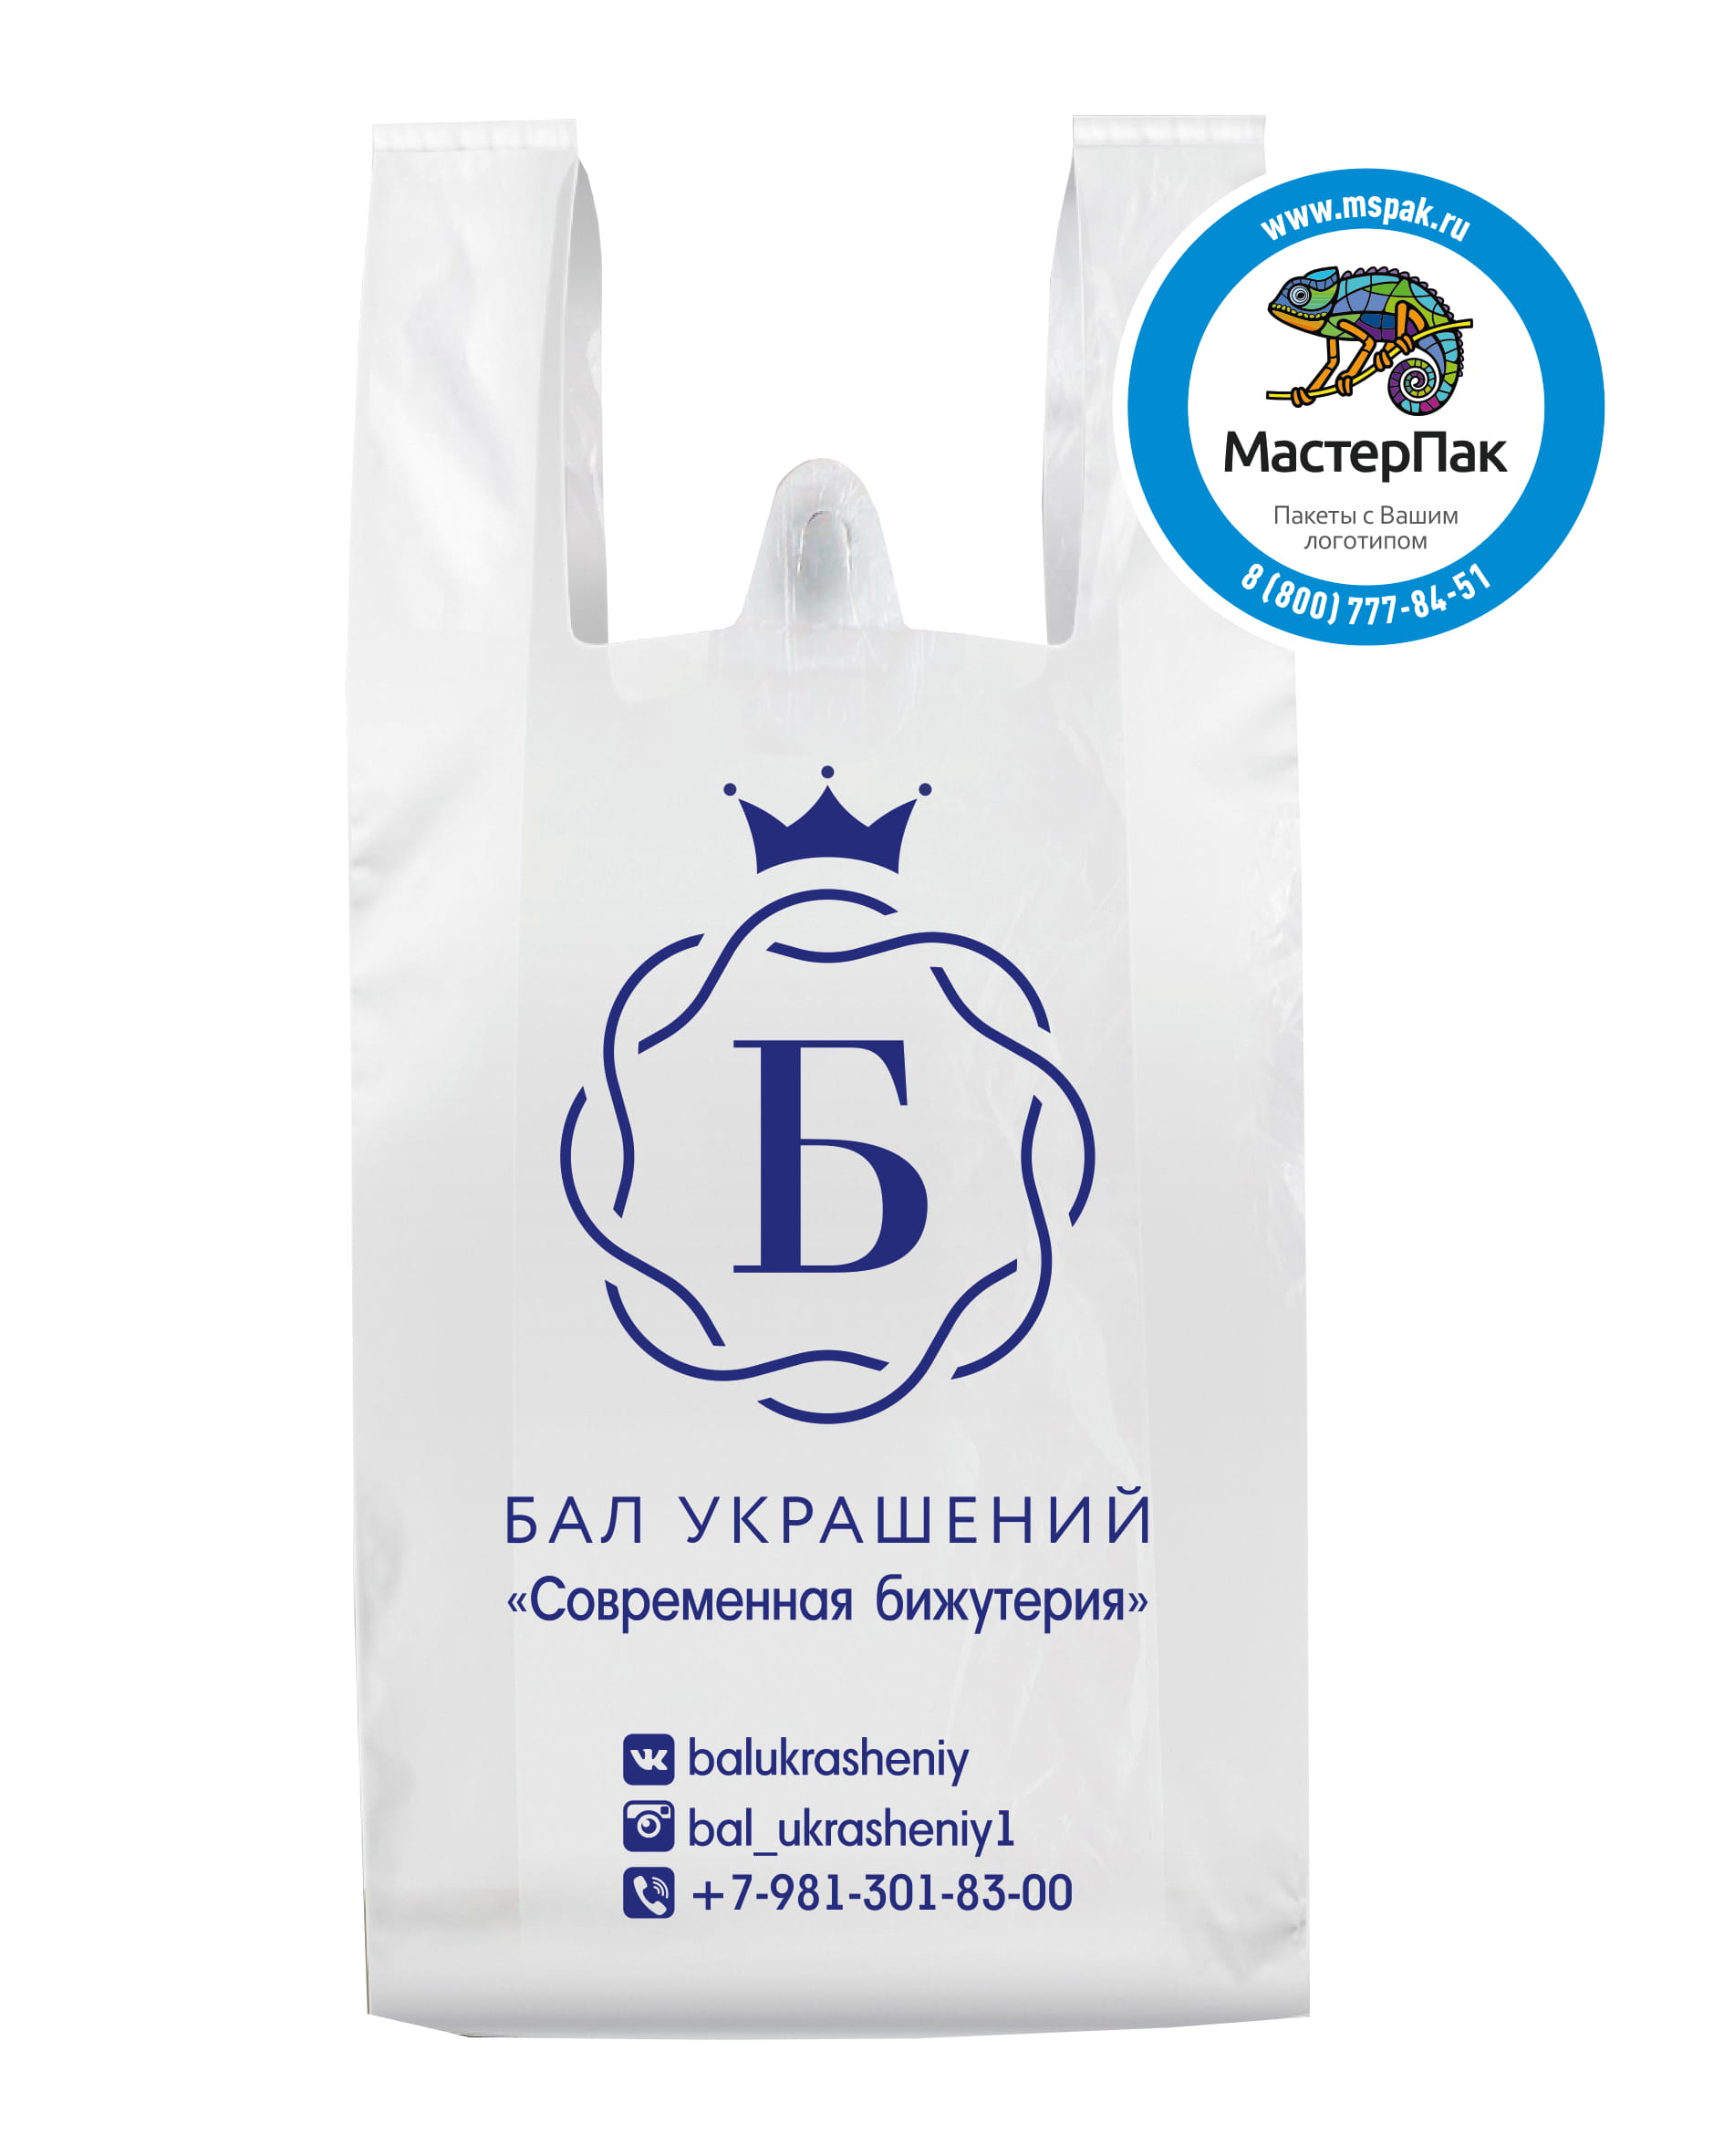 Пакет-майка ПНД с логотипом Бал украшений, 23 мкм, 36*60, Мурманск